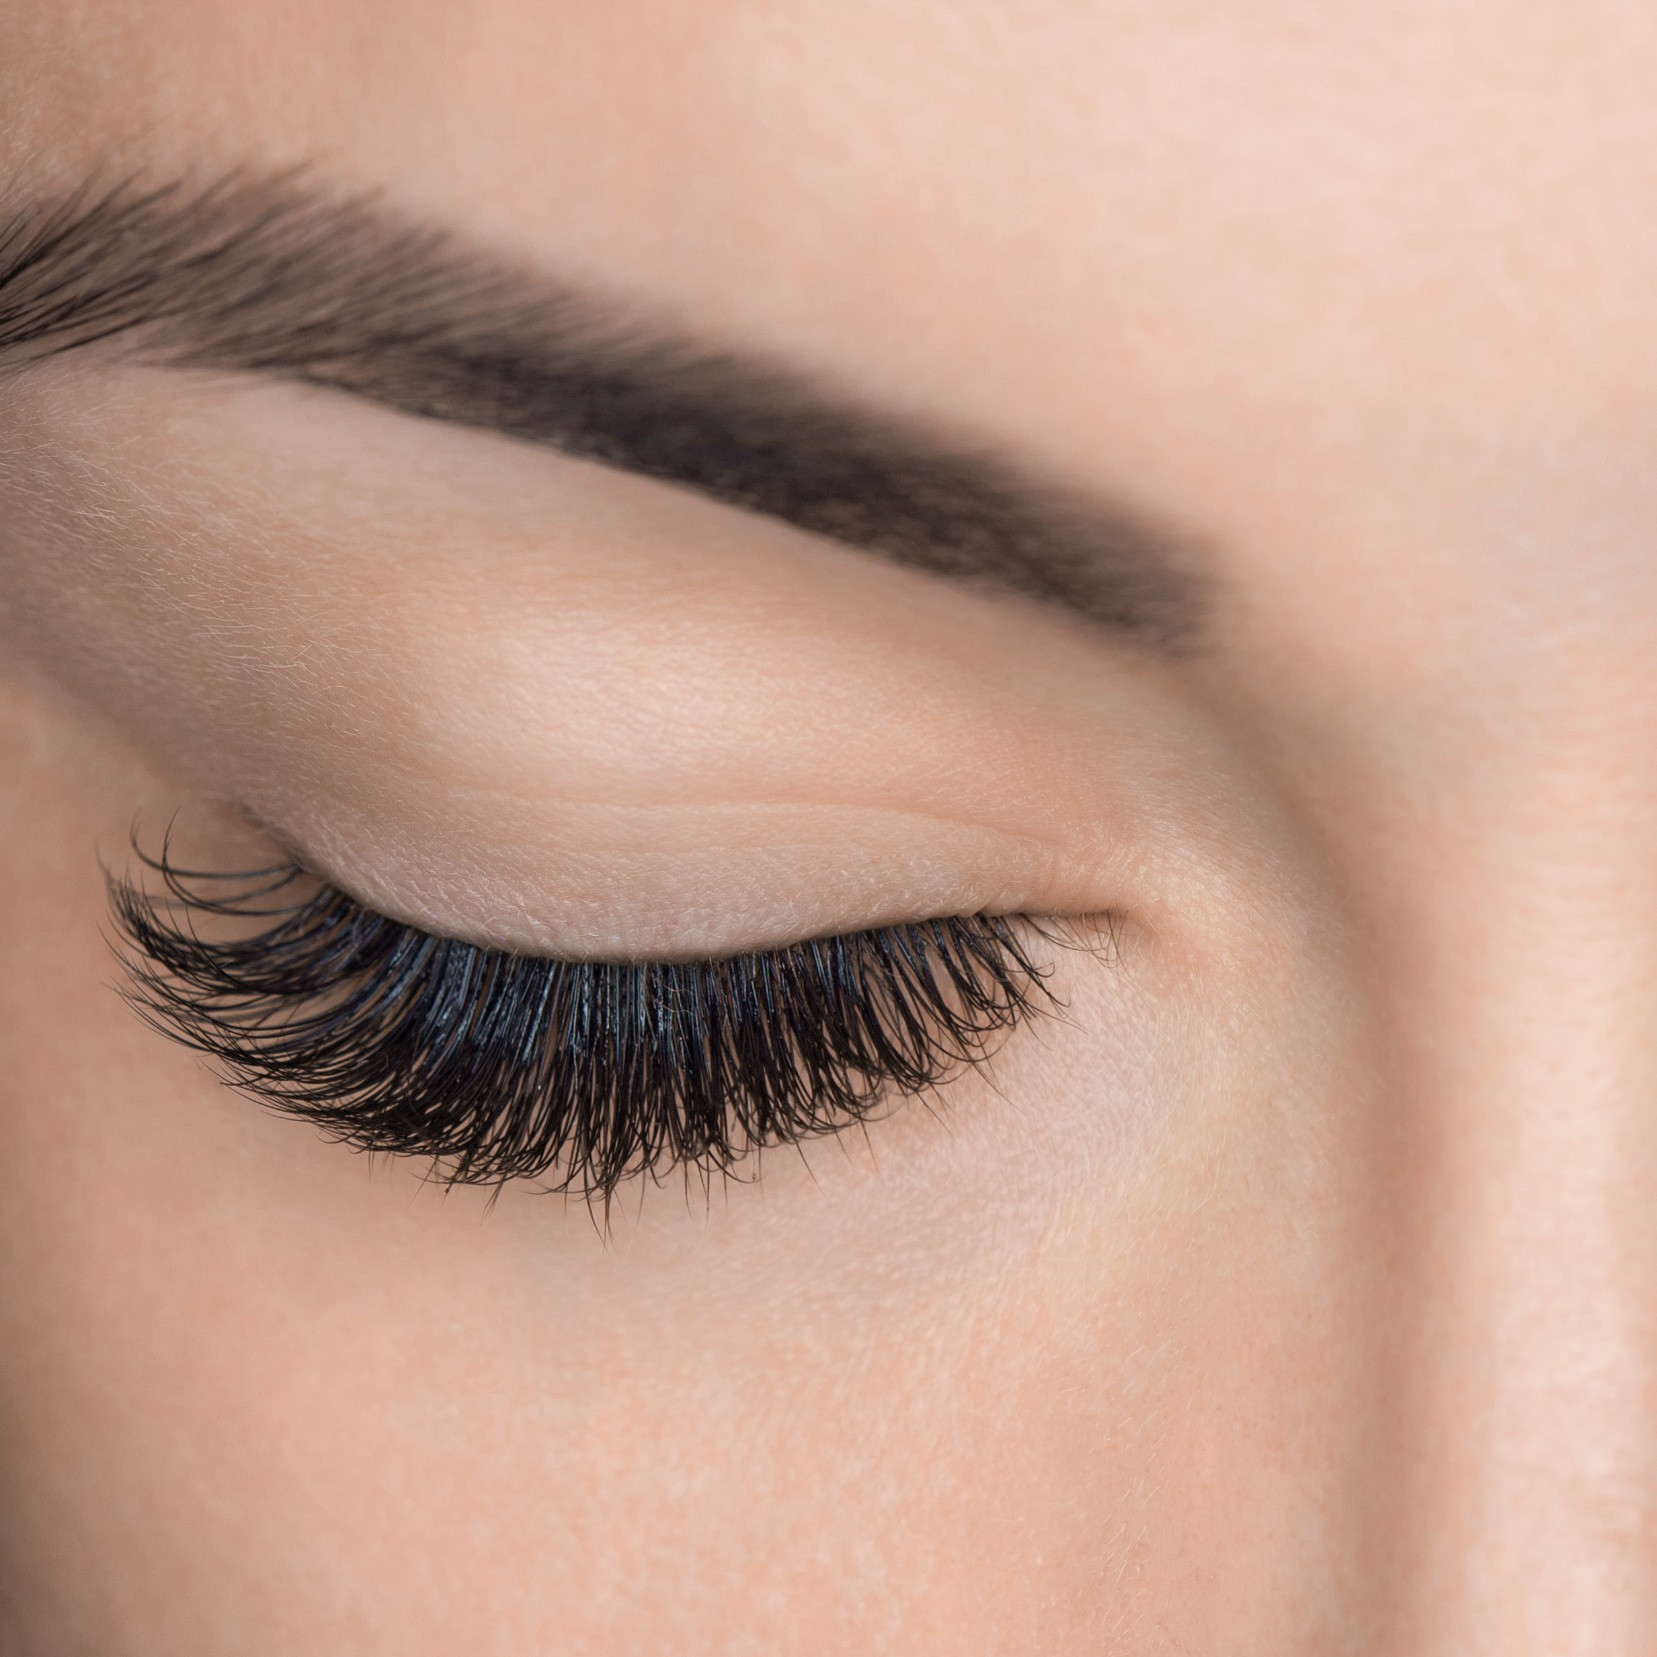 Eyelash Extension Start from $95